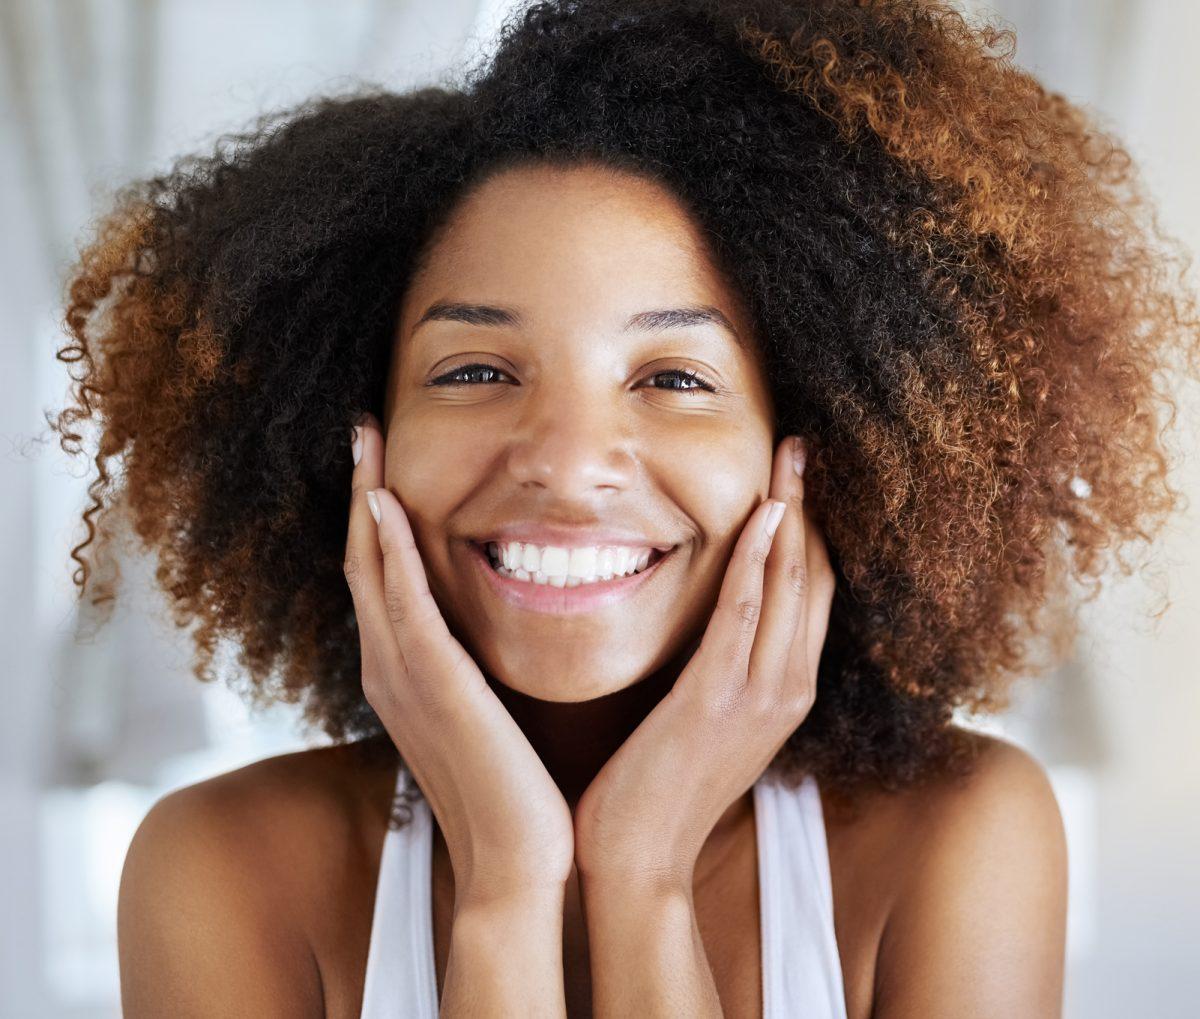 Healthy skin looks good and feels good | Dentist Downtown Calgary | Eau Claire Park Dental